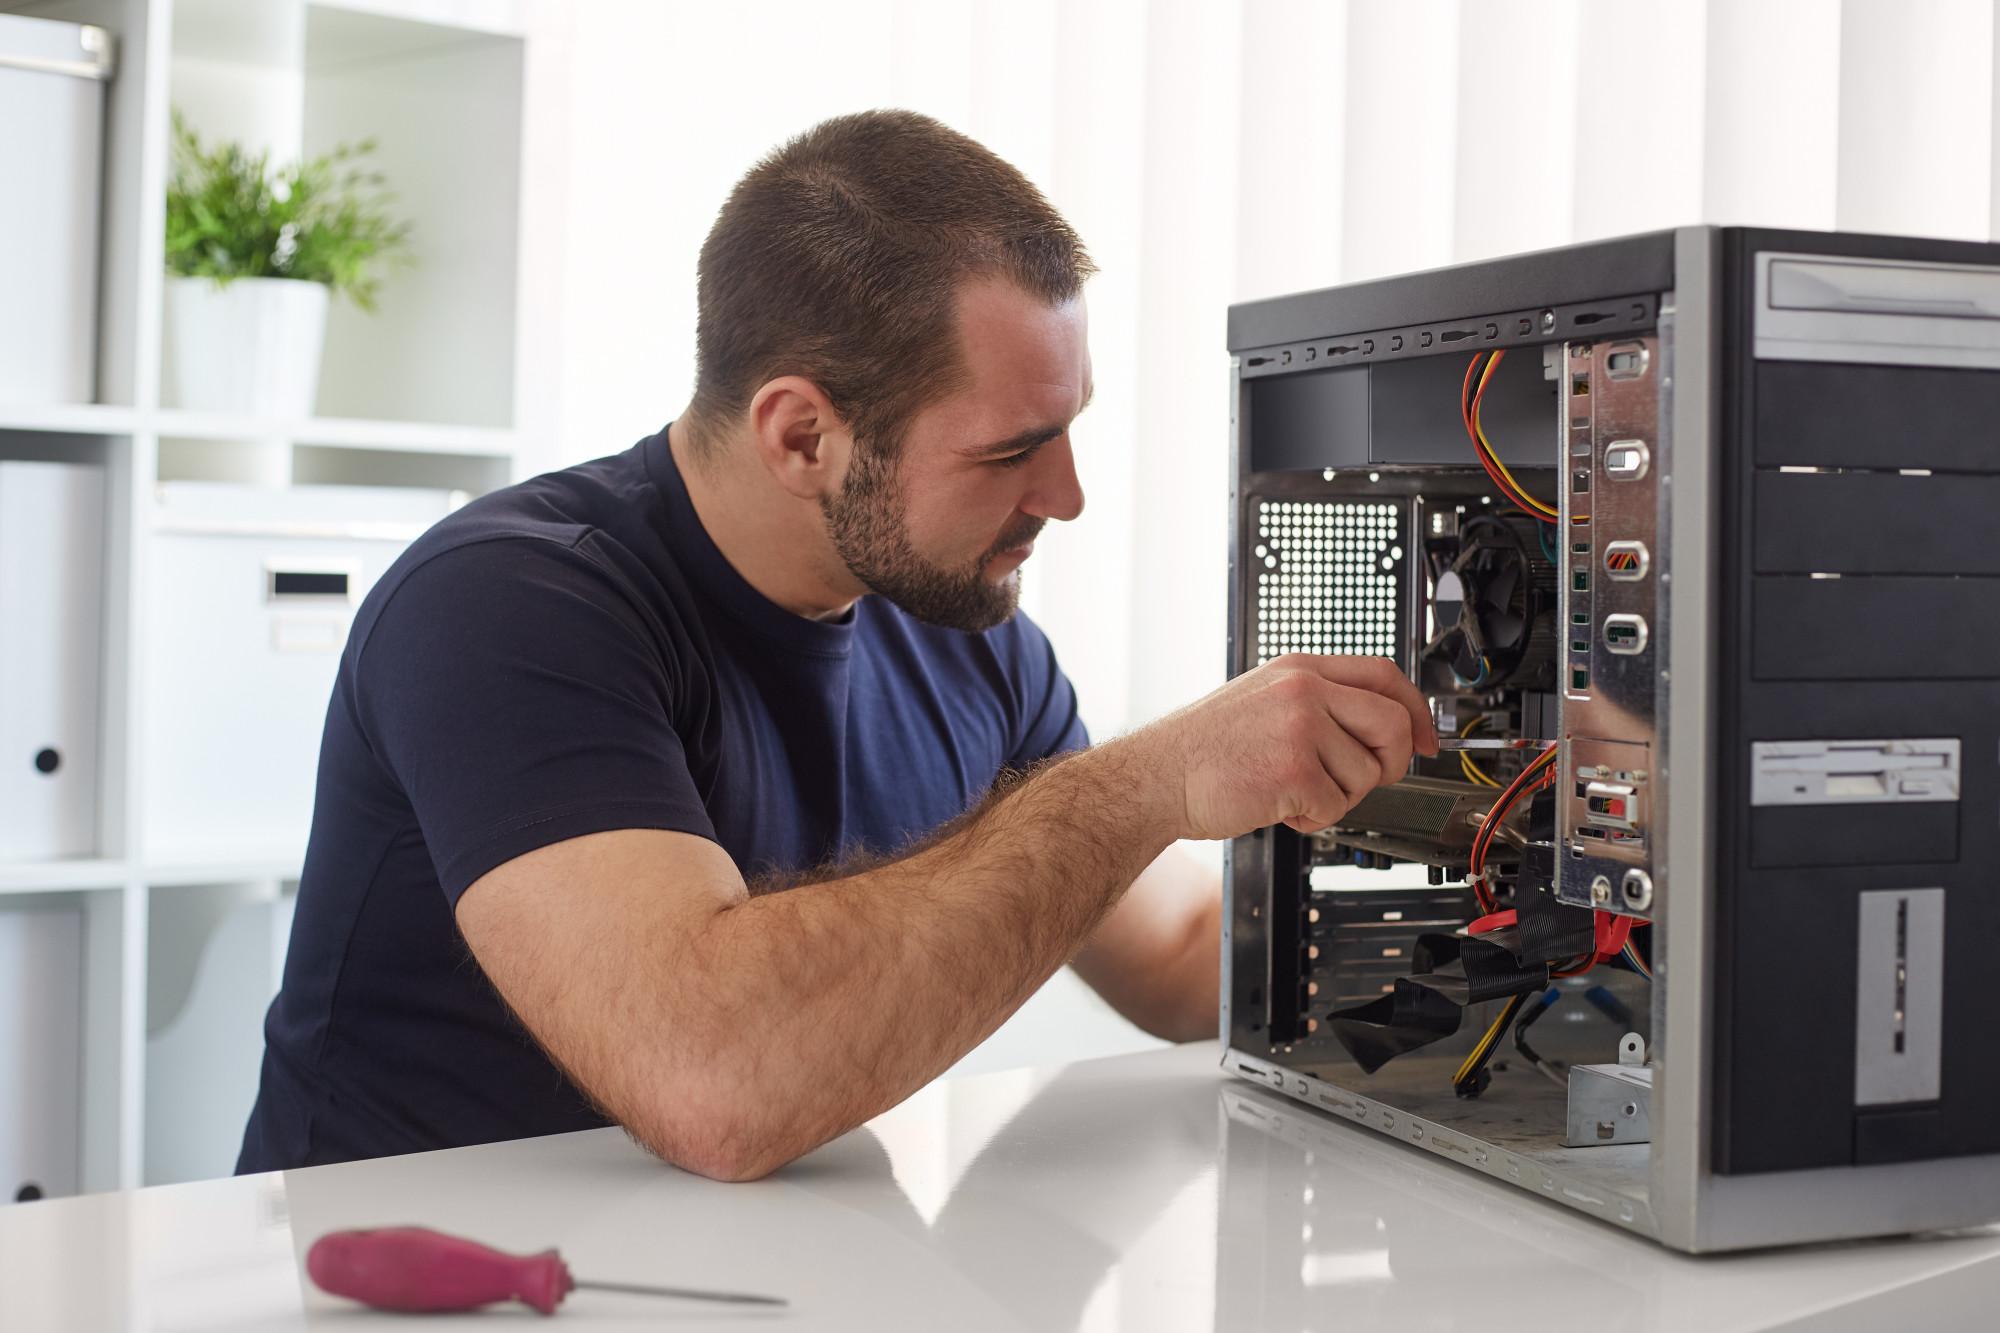 Ремонт компьютера / Man repairing computer